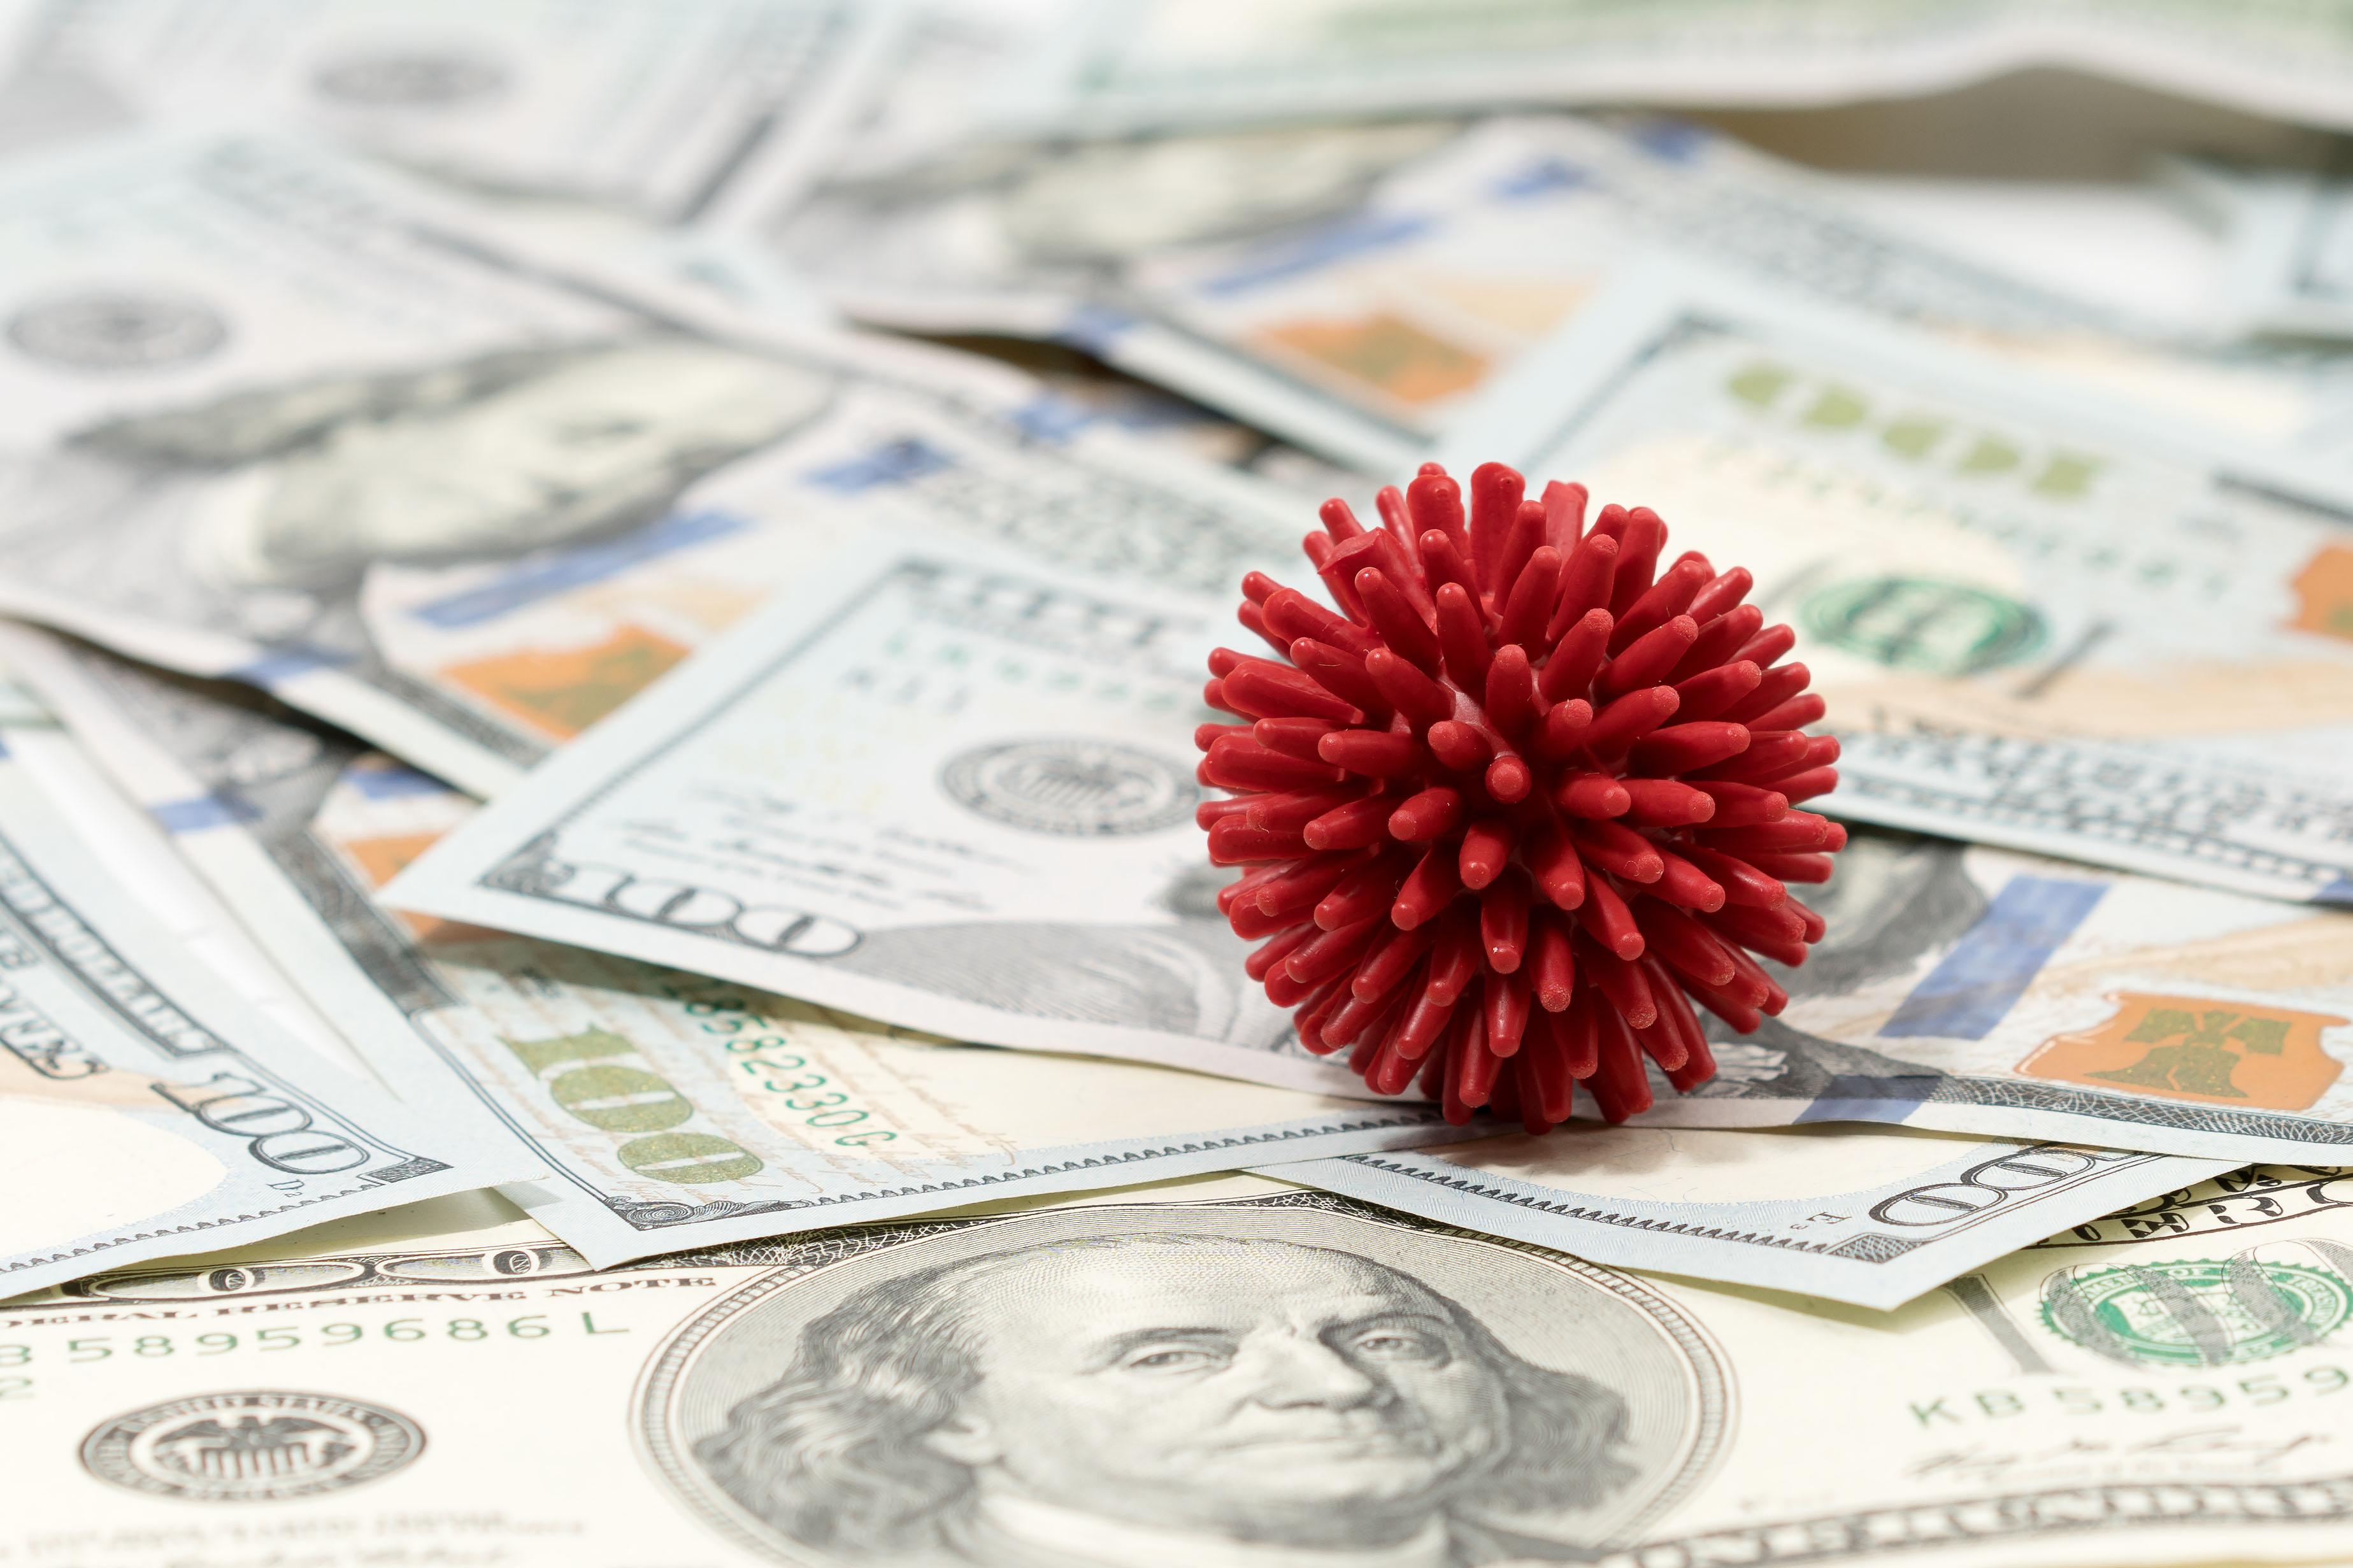 Better Coronavirus Stock: OPKO Health or Emergent ...